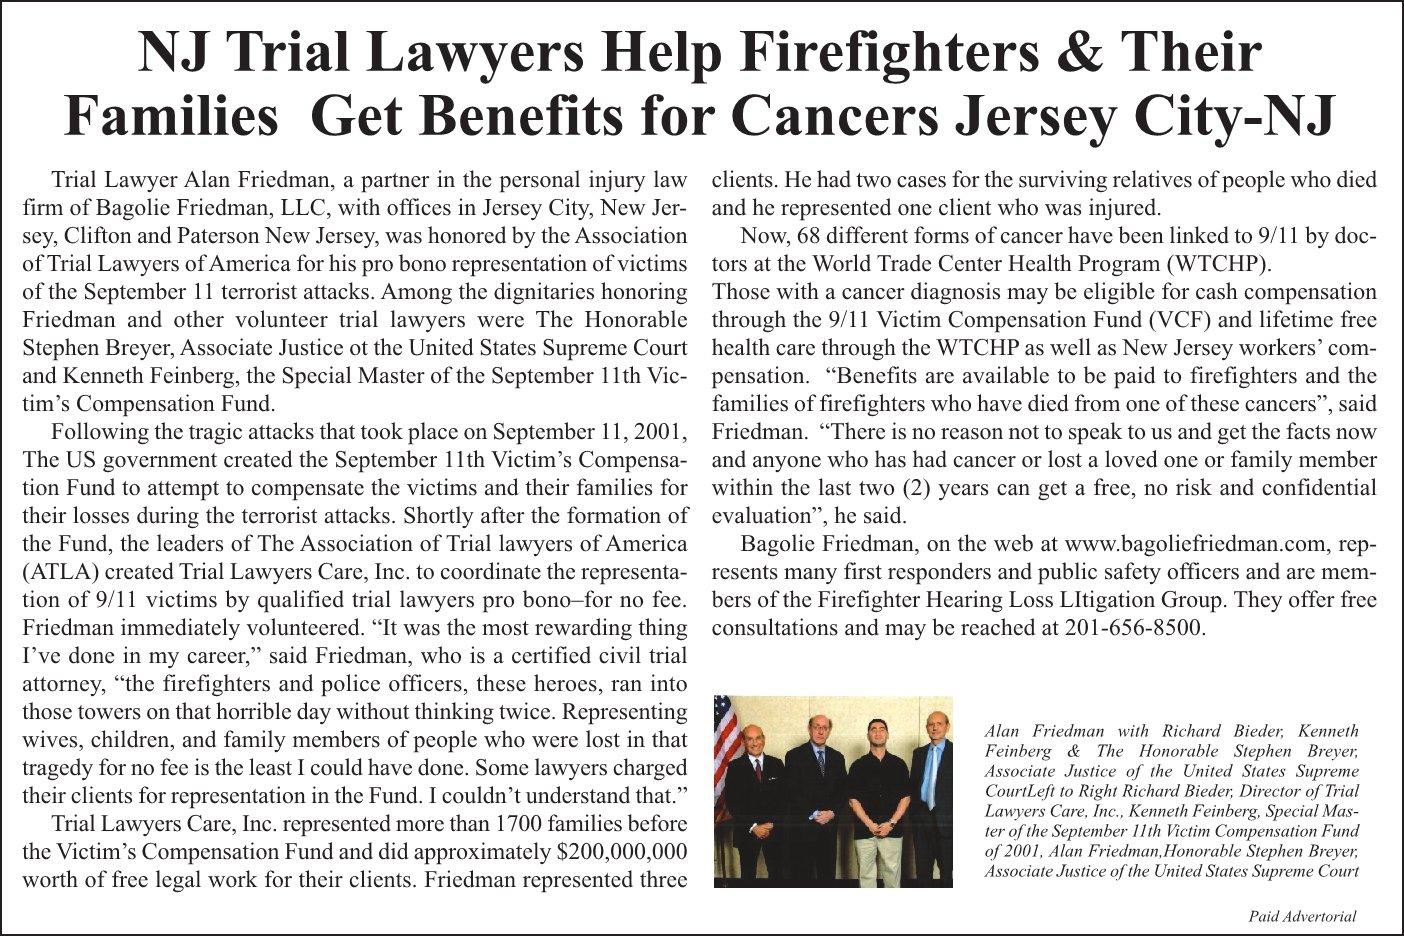 NJ Trial Lawyers, Bagolie Friedman, Help Firefighters